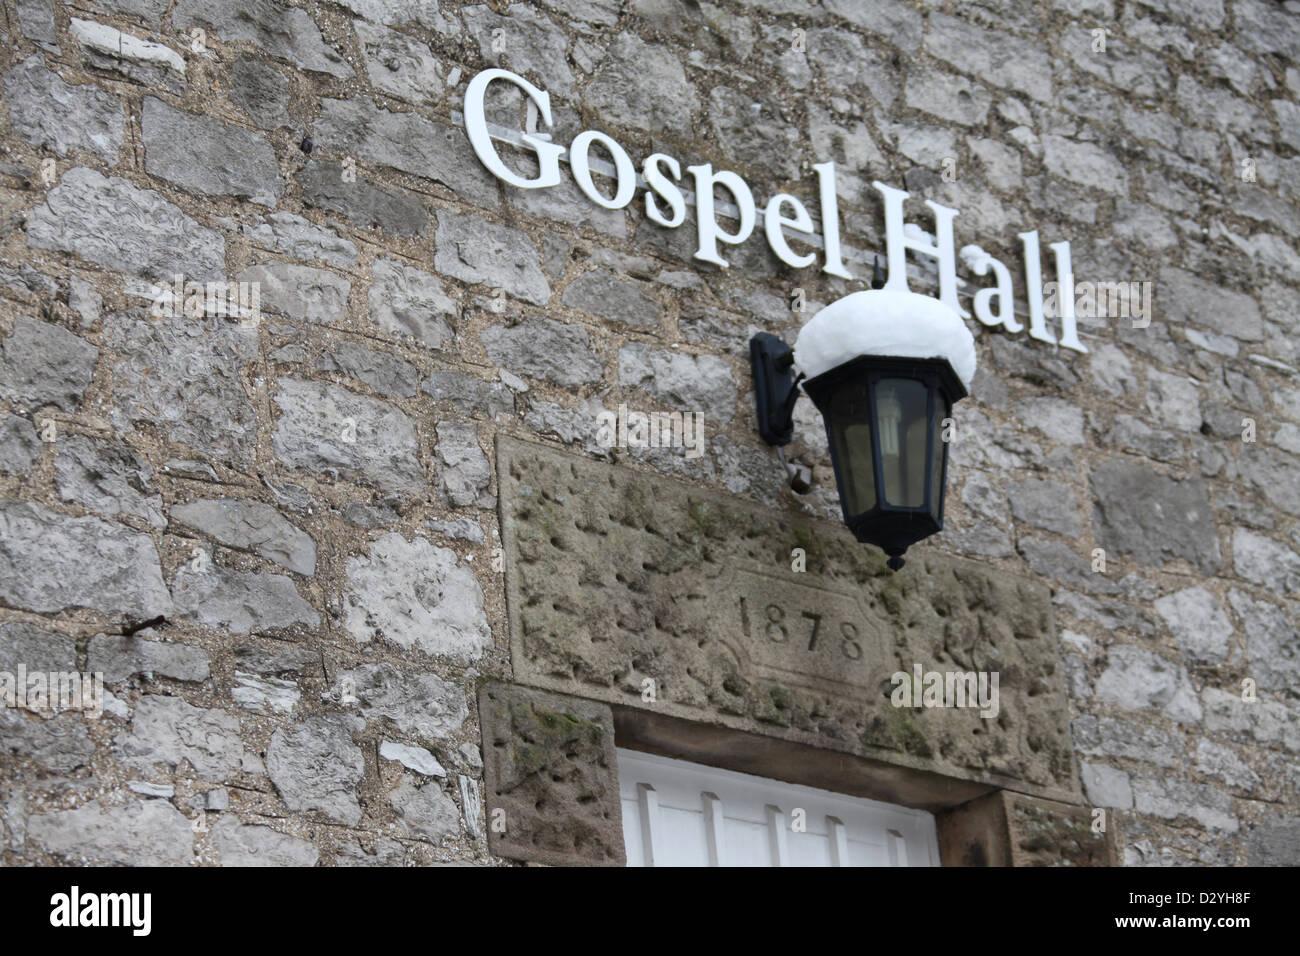 Gospel Hall in Bakewell dated 1878 - Stock Image